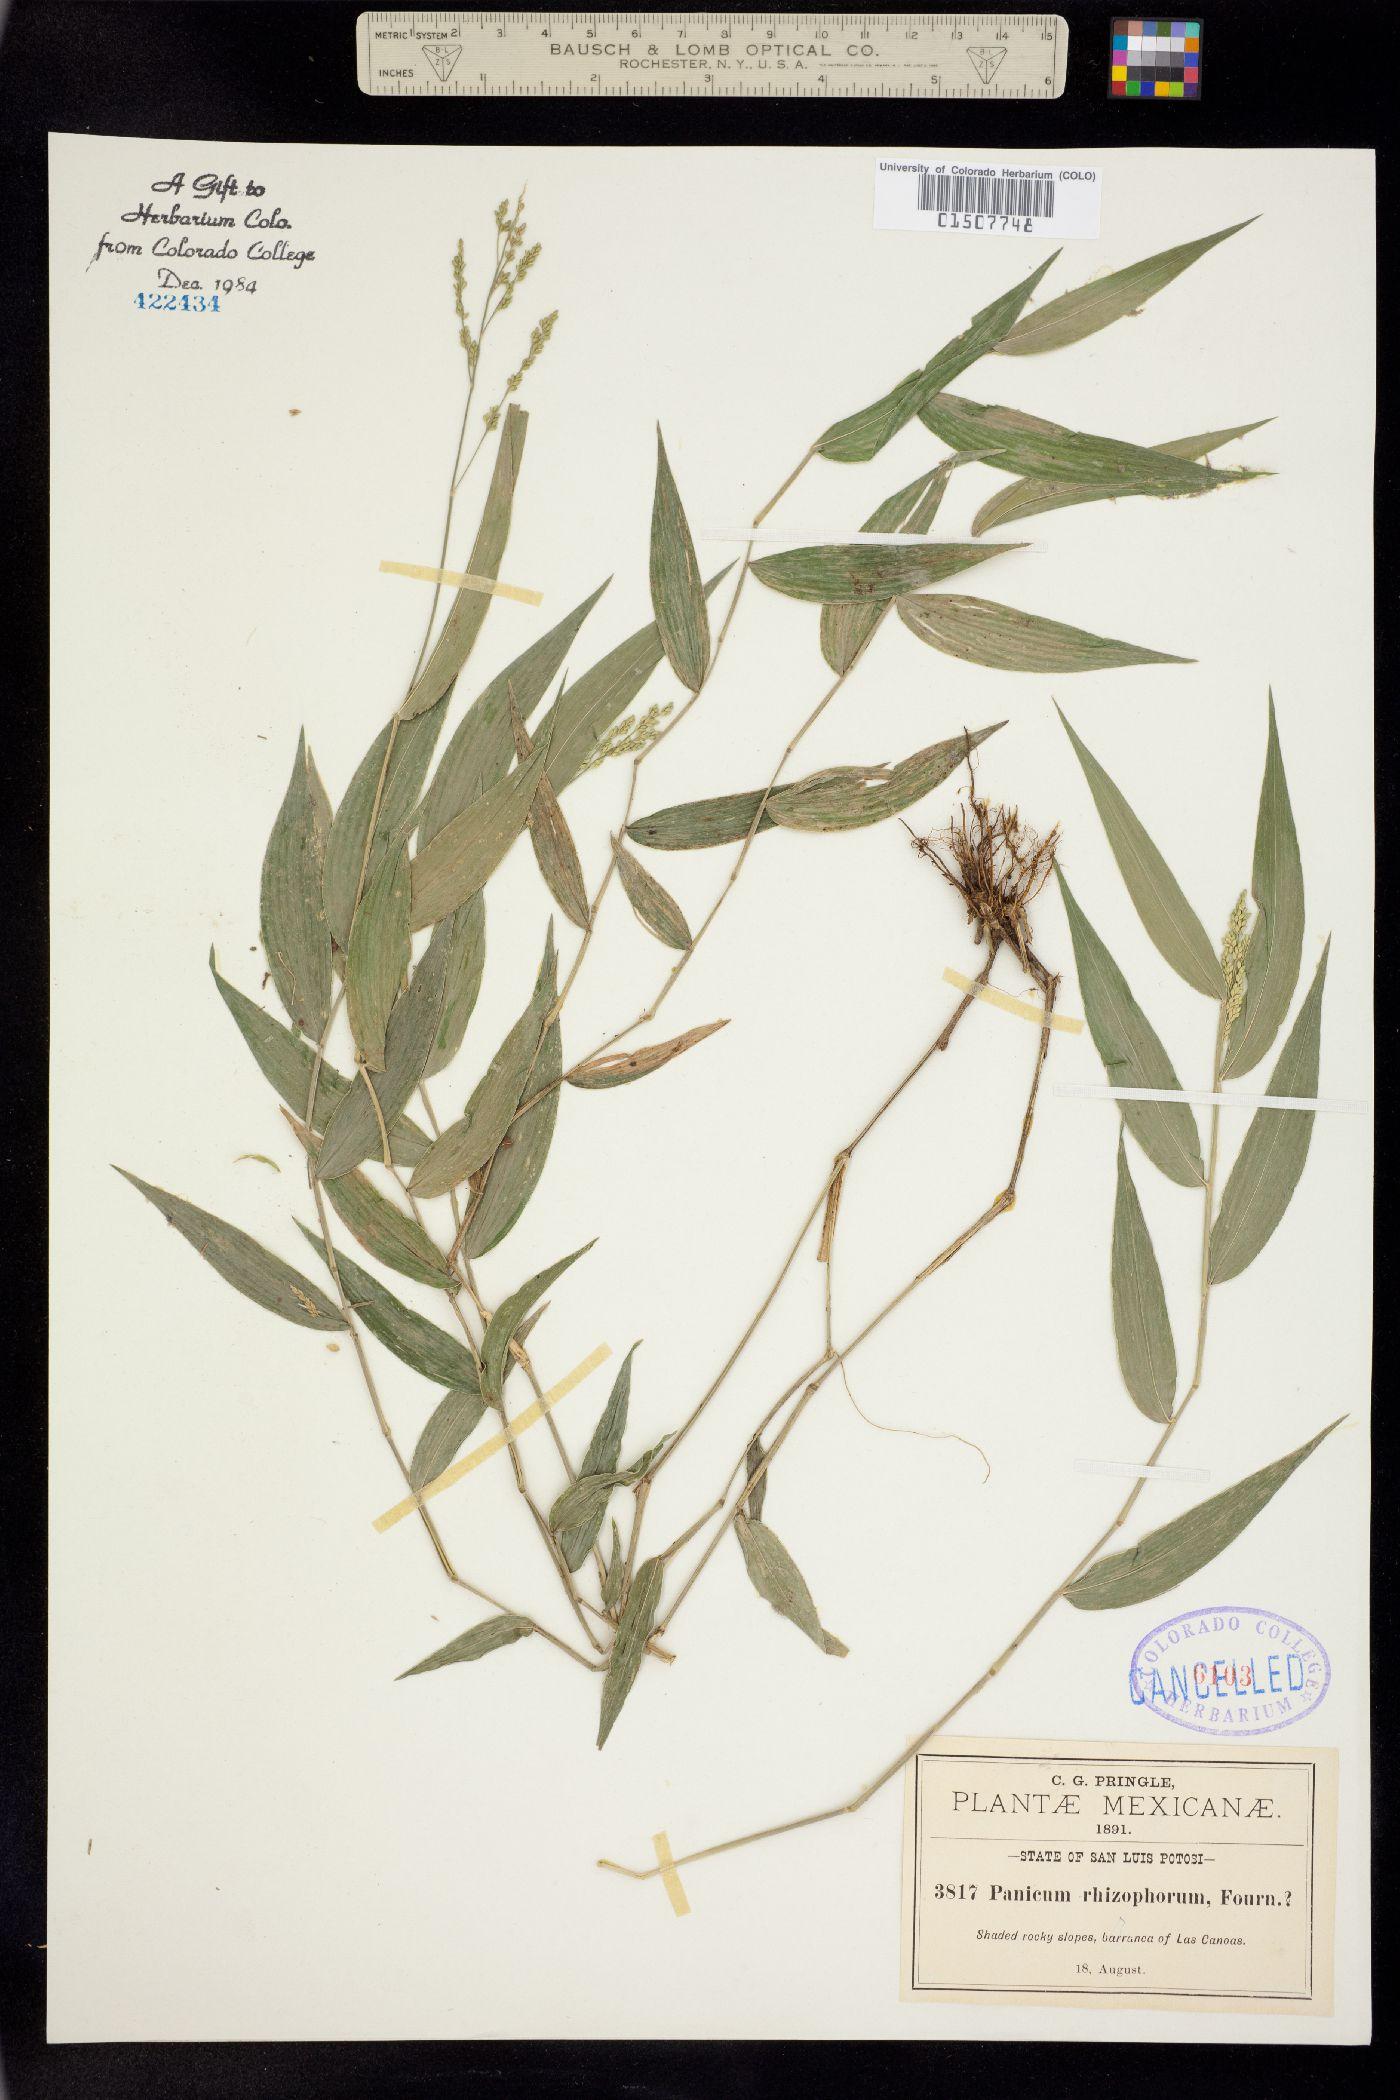 Panicum rhizophorum image